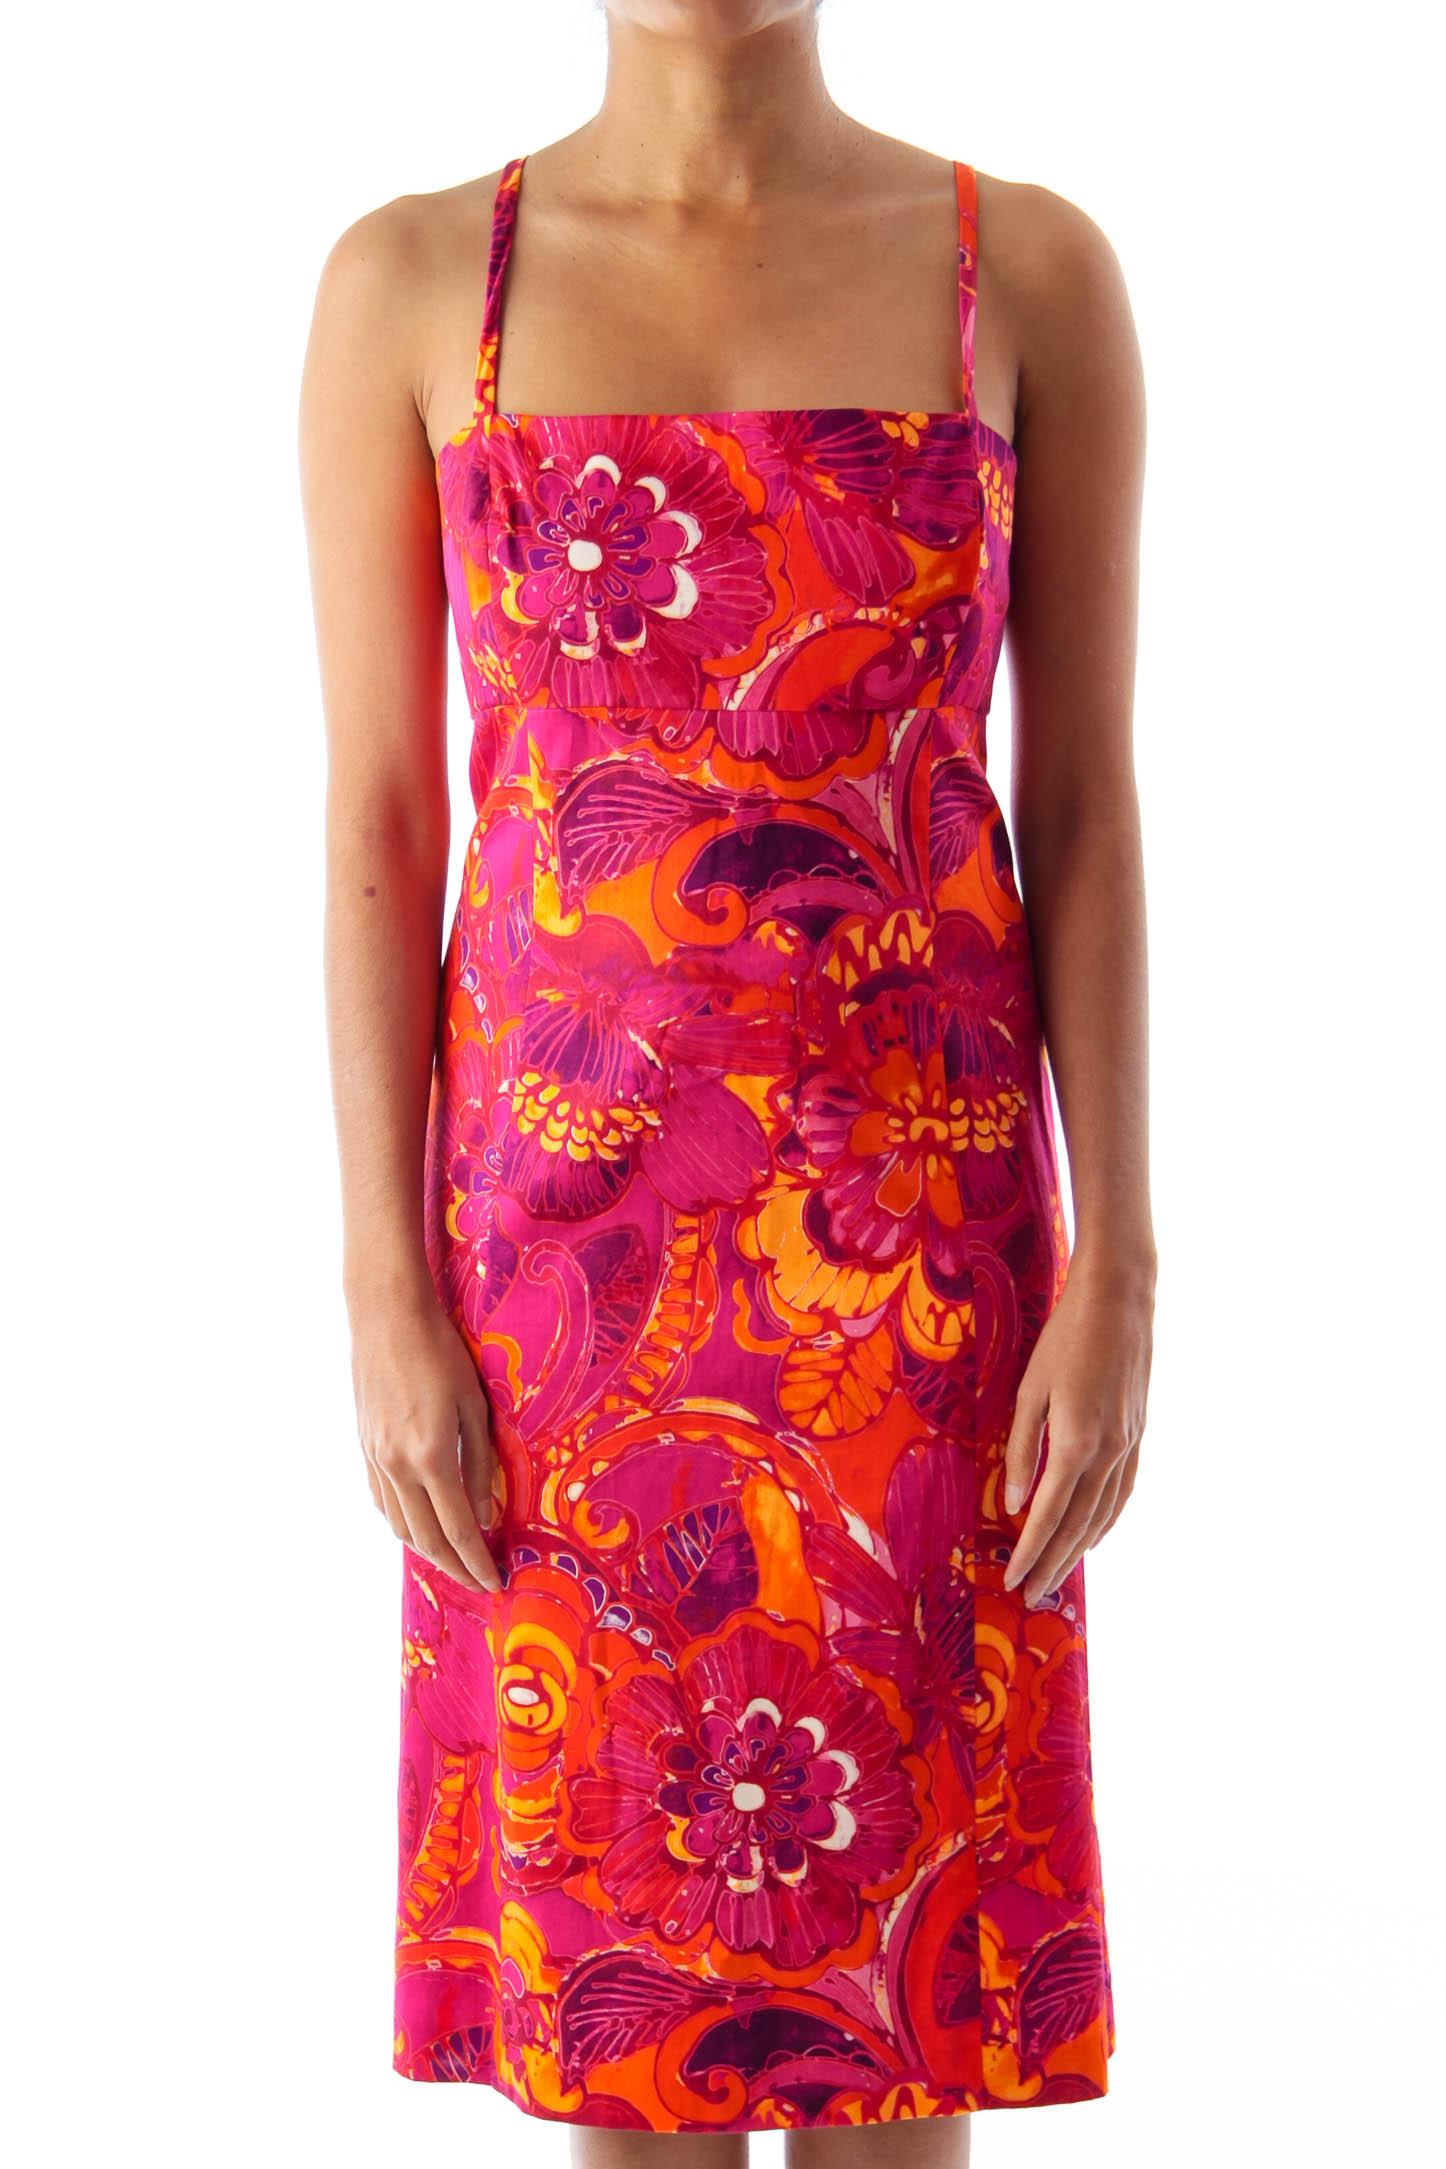 Pink & Orange Mini Dress